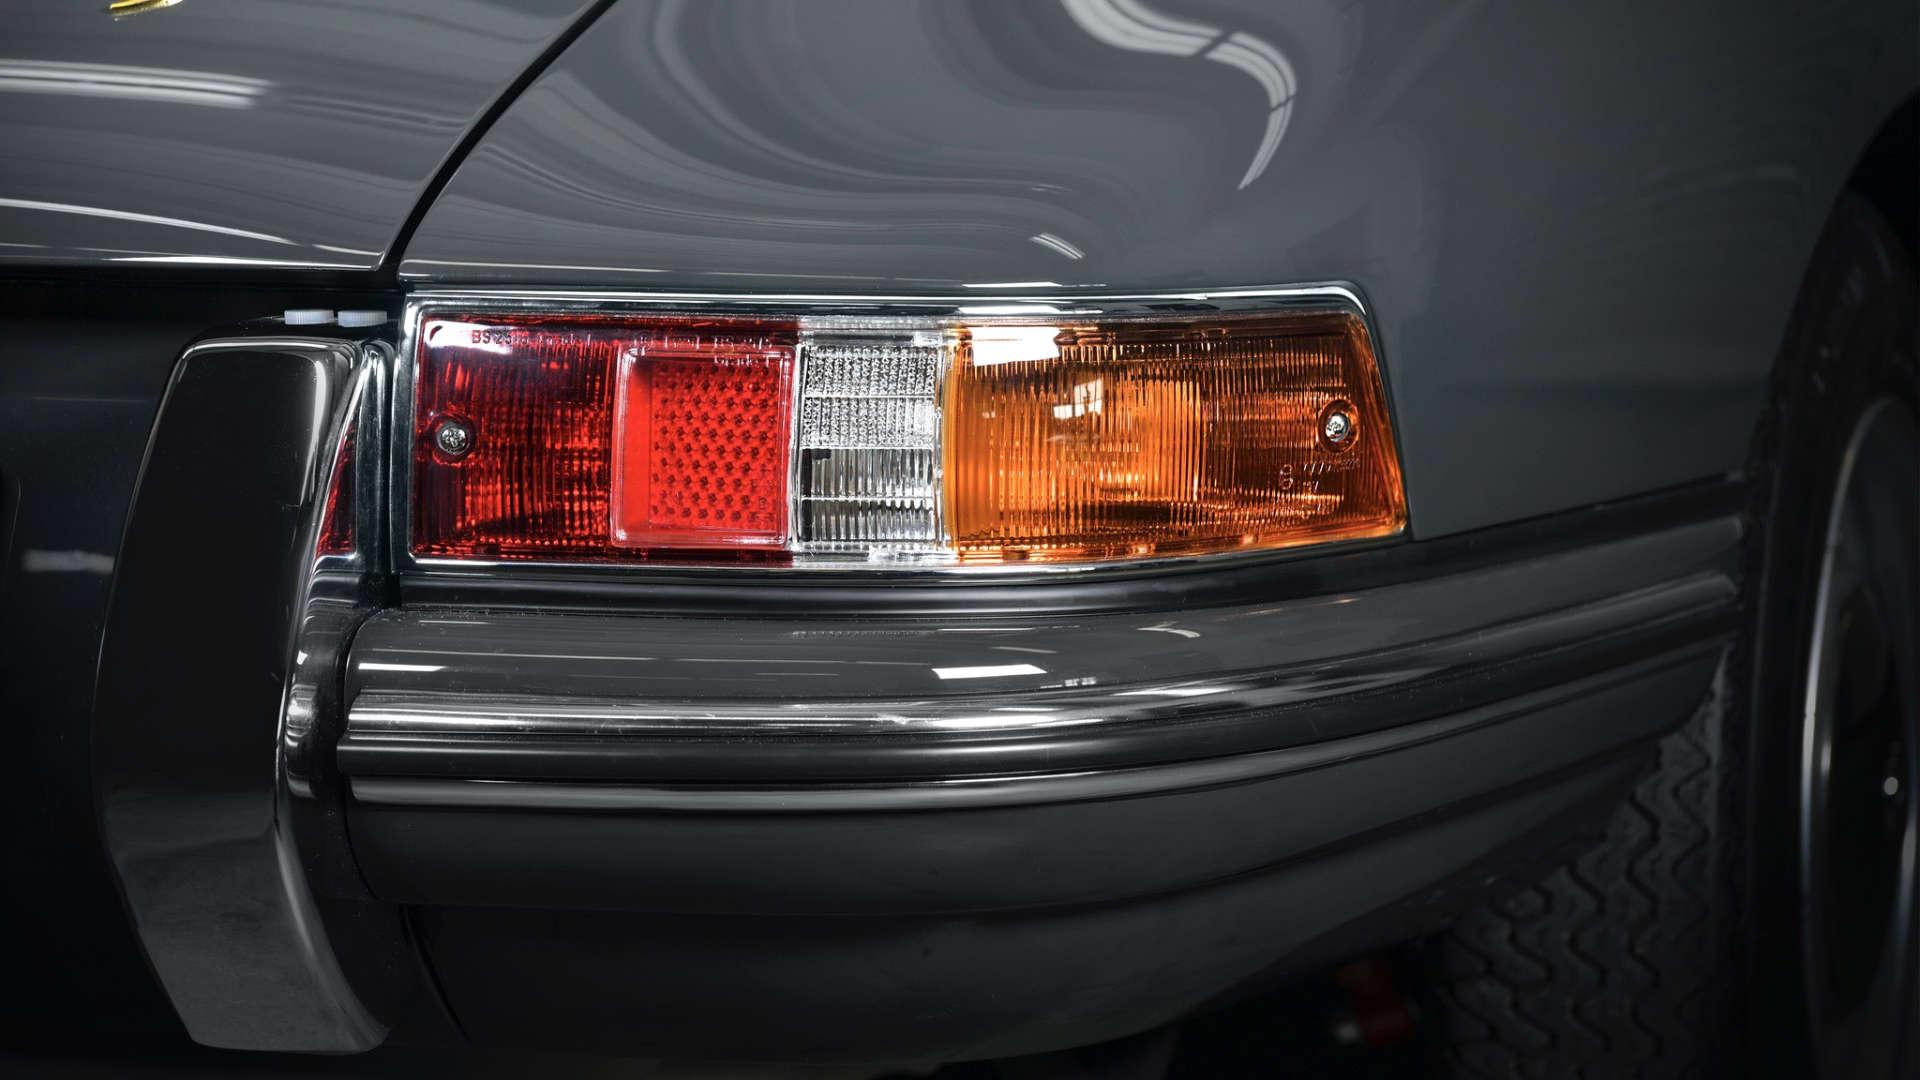 Blinkerleuchten 911 kurzer Radstand